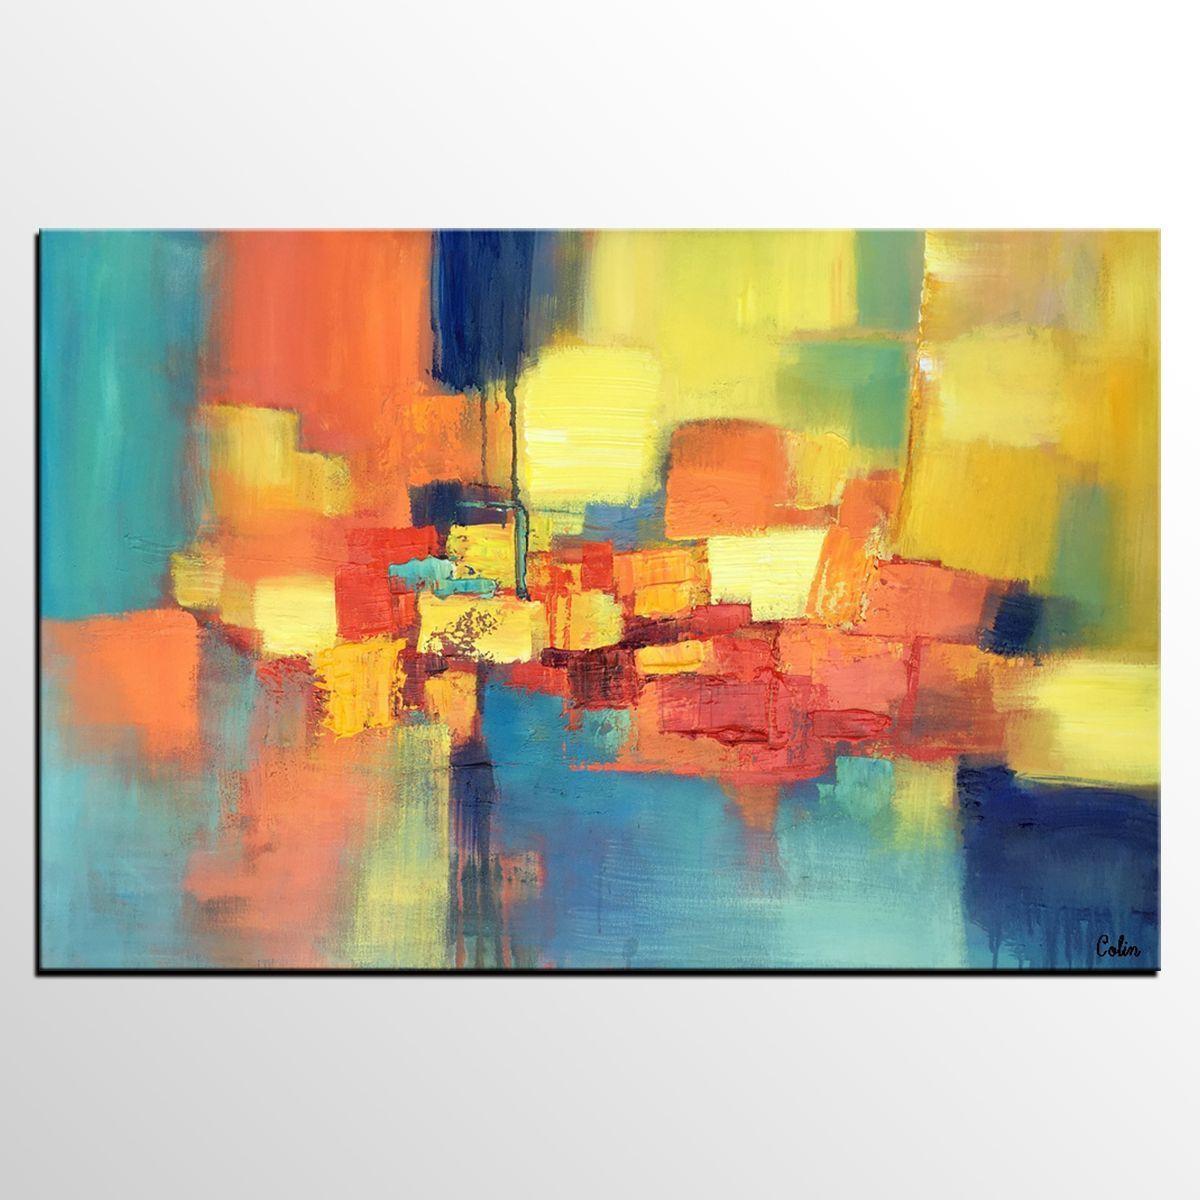 Abstract art for sale original wall art canvas art painting buy art online